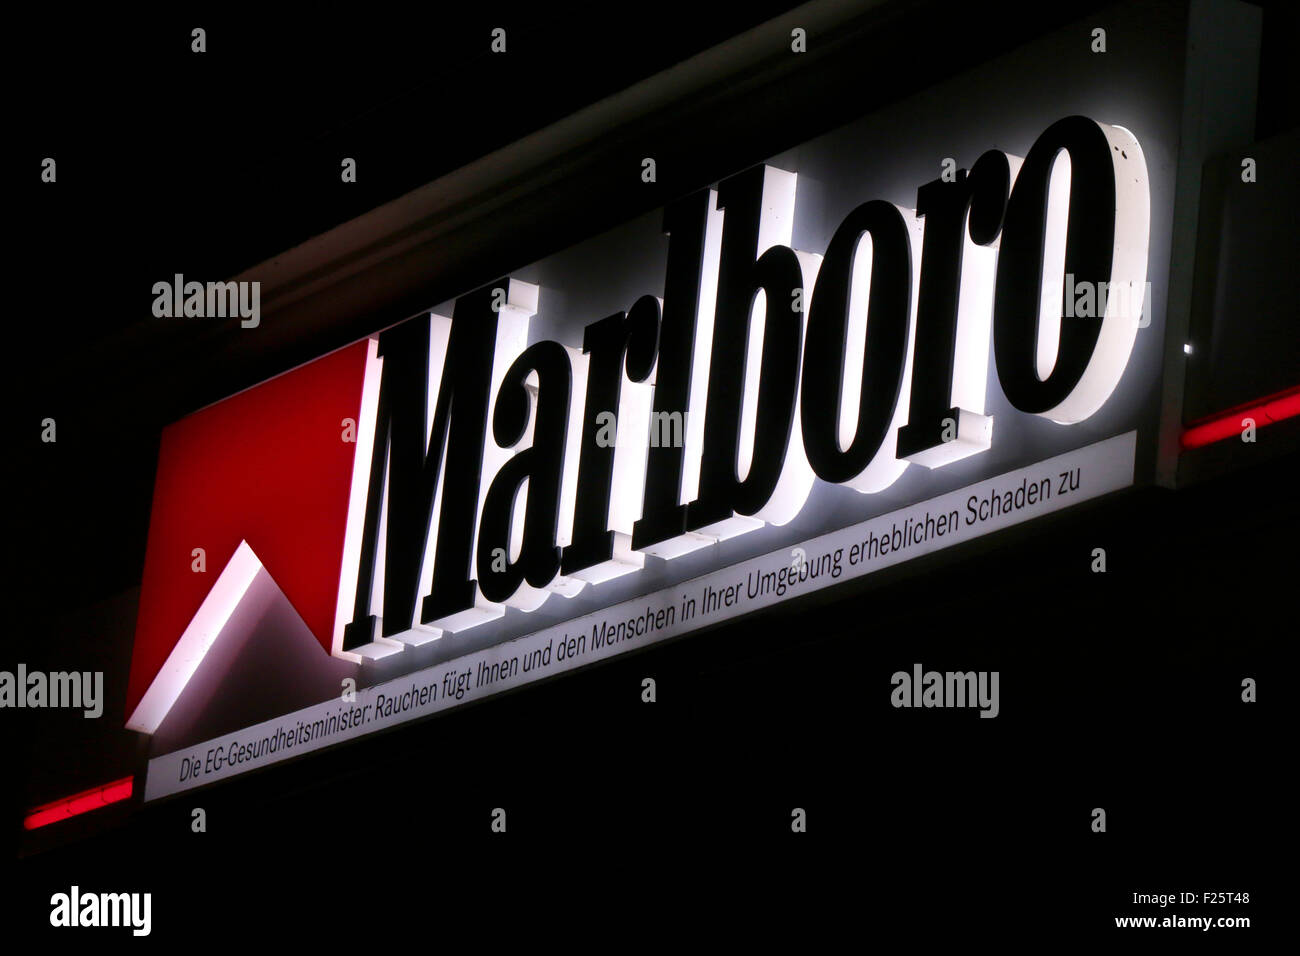 berlin cigarette stockfotos berlin cigarette bilder alamy. Black Bedroom Furniture Sets. Home Design Ideas